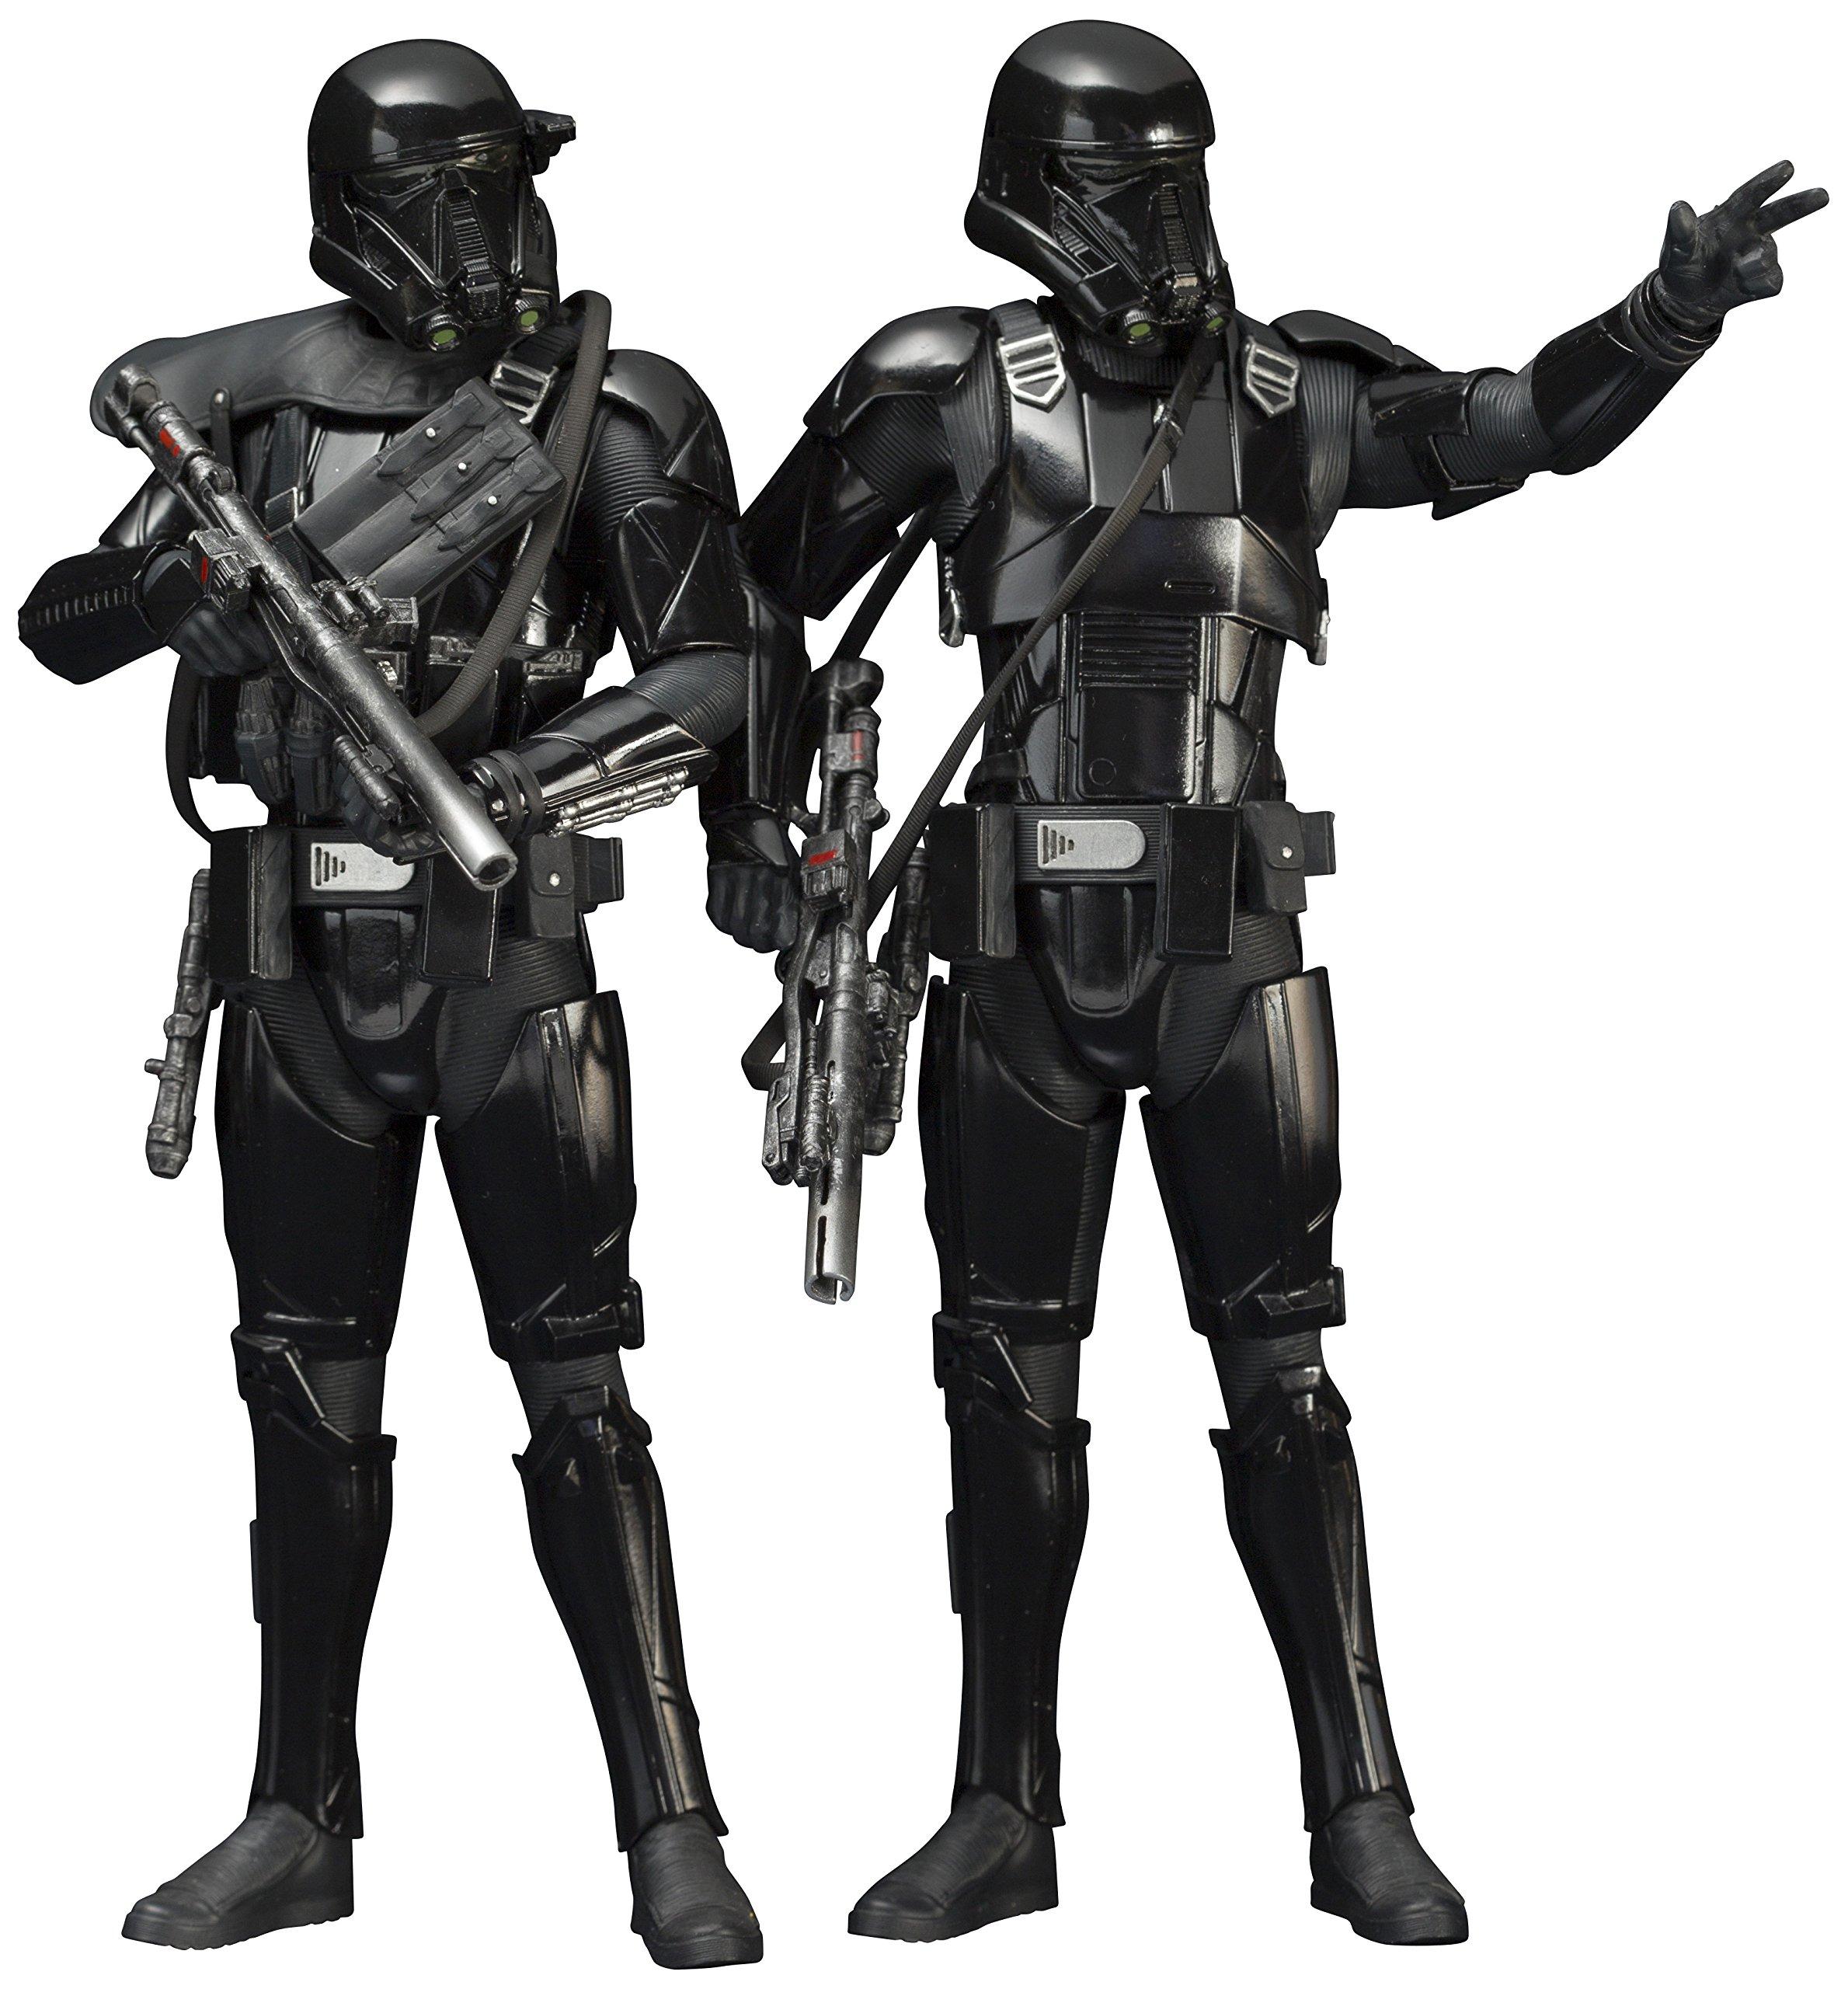 Kotobukiya Star Wars: Rogue One: Death Trooper ArtFX+ Two-Pack